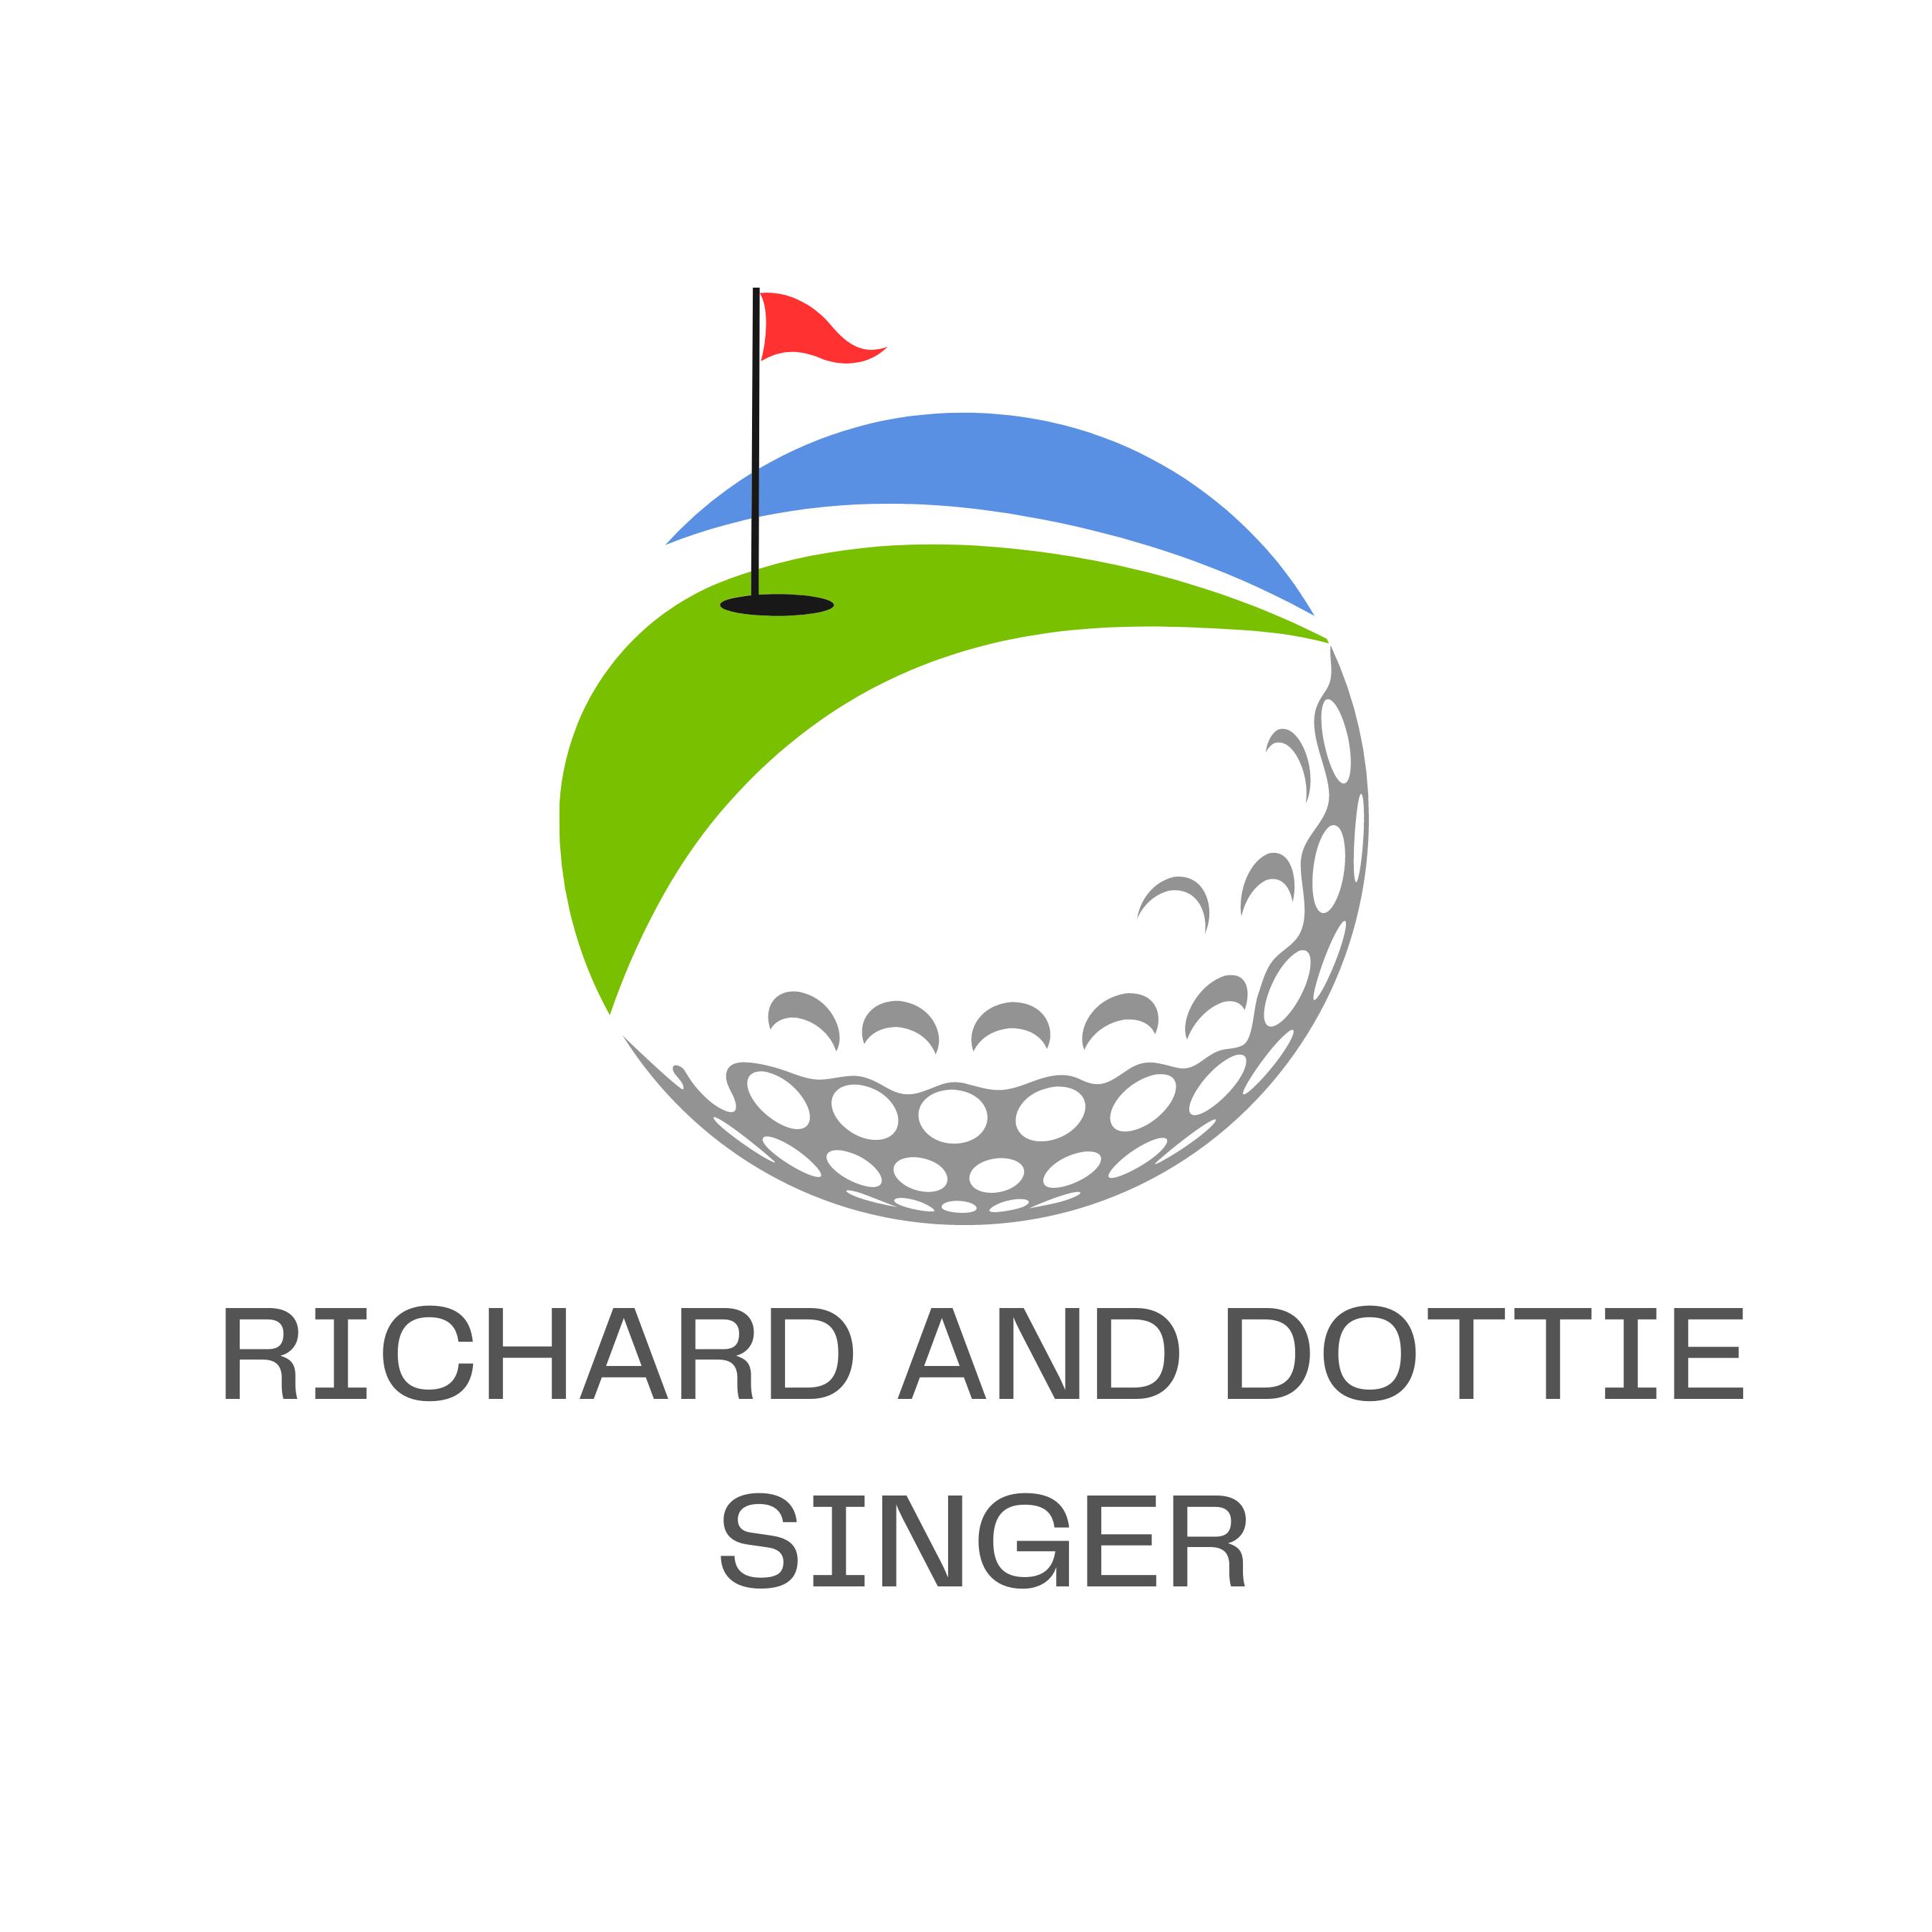 Richard and Dottie Singer